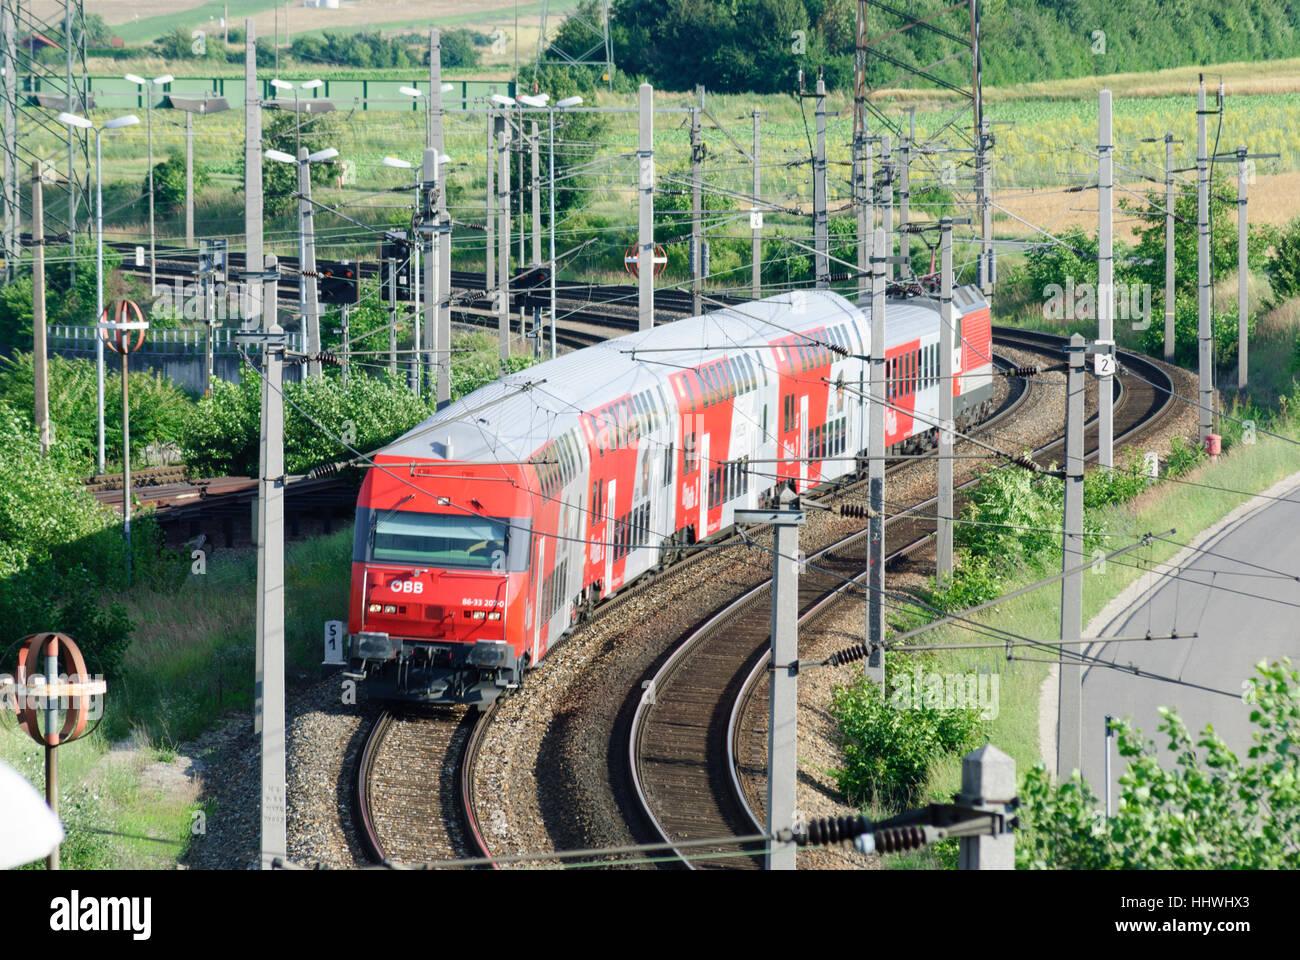 Wien, Wien: Regionalzug der ÖBB, 10., Wien, Österreich Stockbild